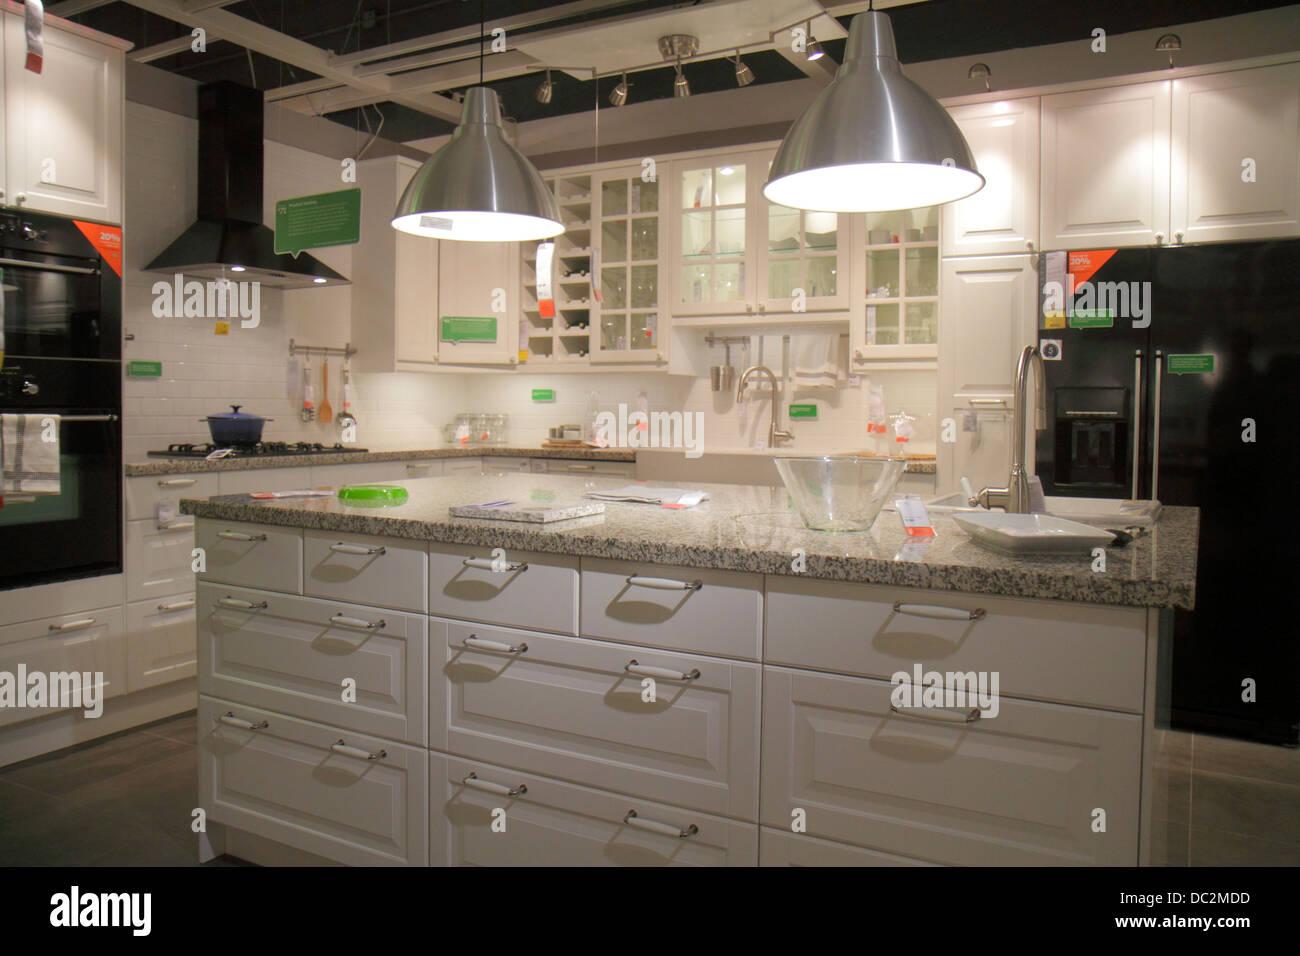 kitchen displays for sale cabinets martha stewart florida sunrise fort ft lauderdale ikea home furnishings